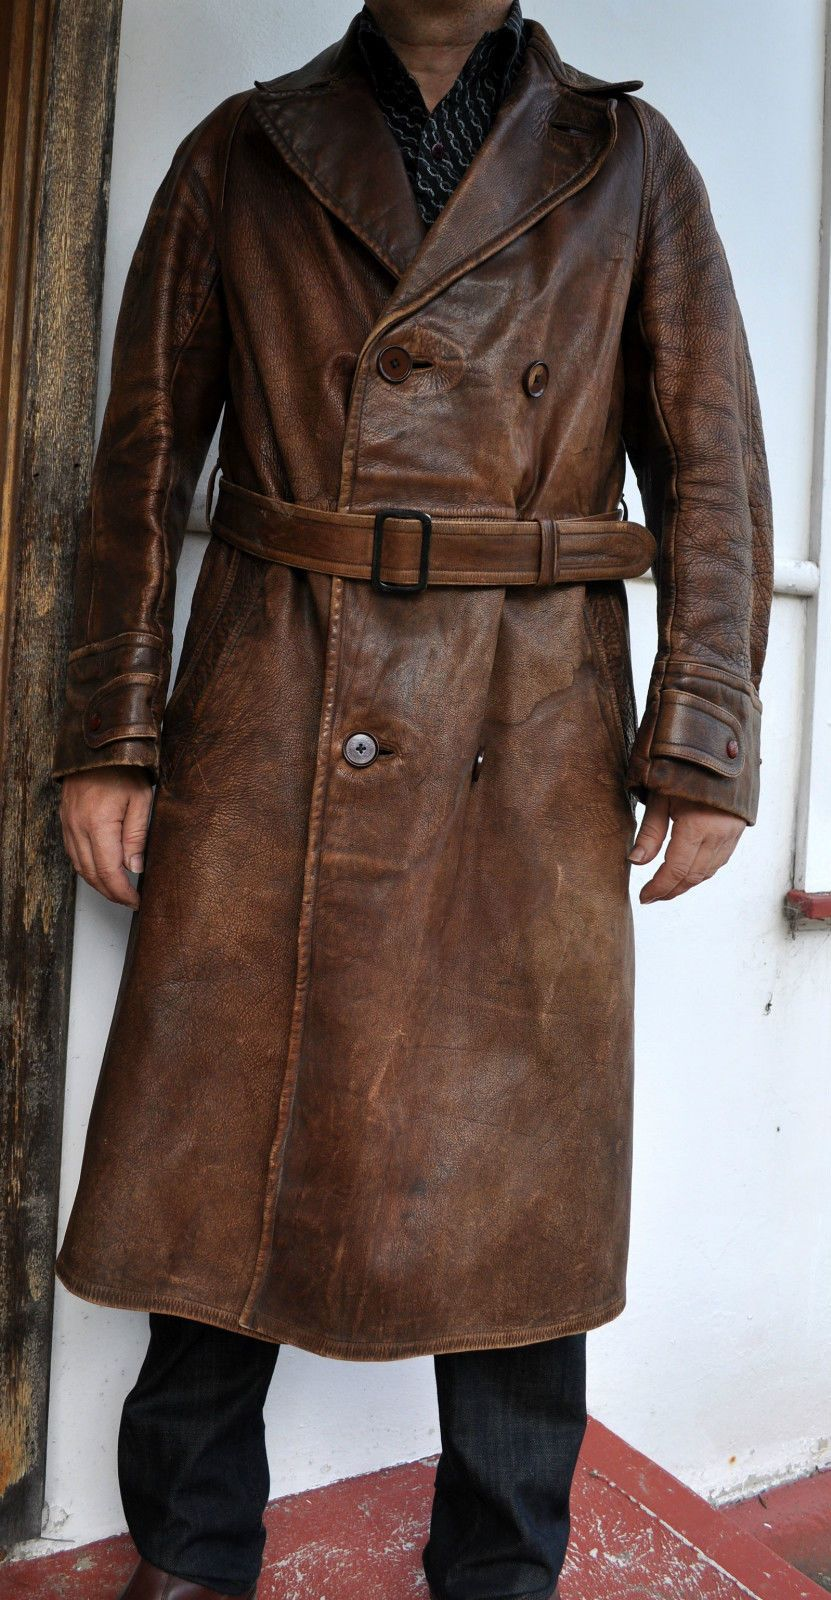 Rare WWI Antique Vintage FullGrain Leather Trench Coat